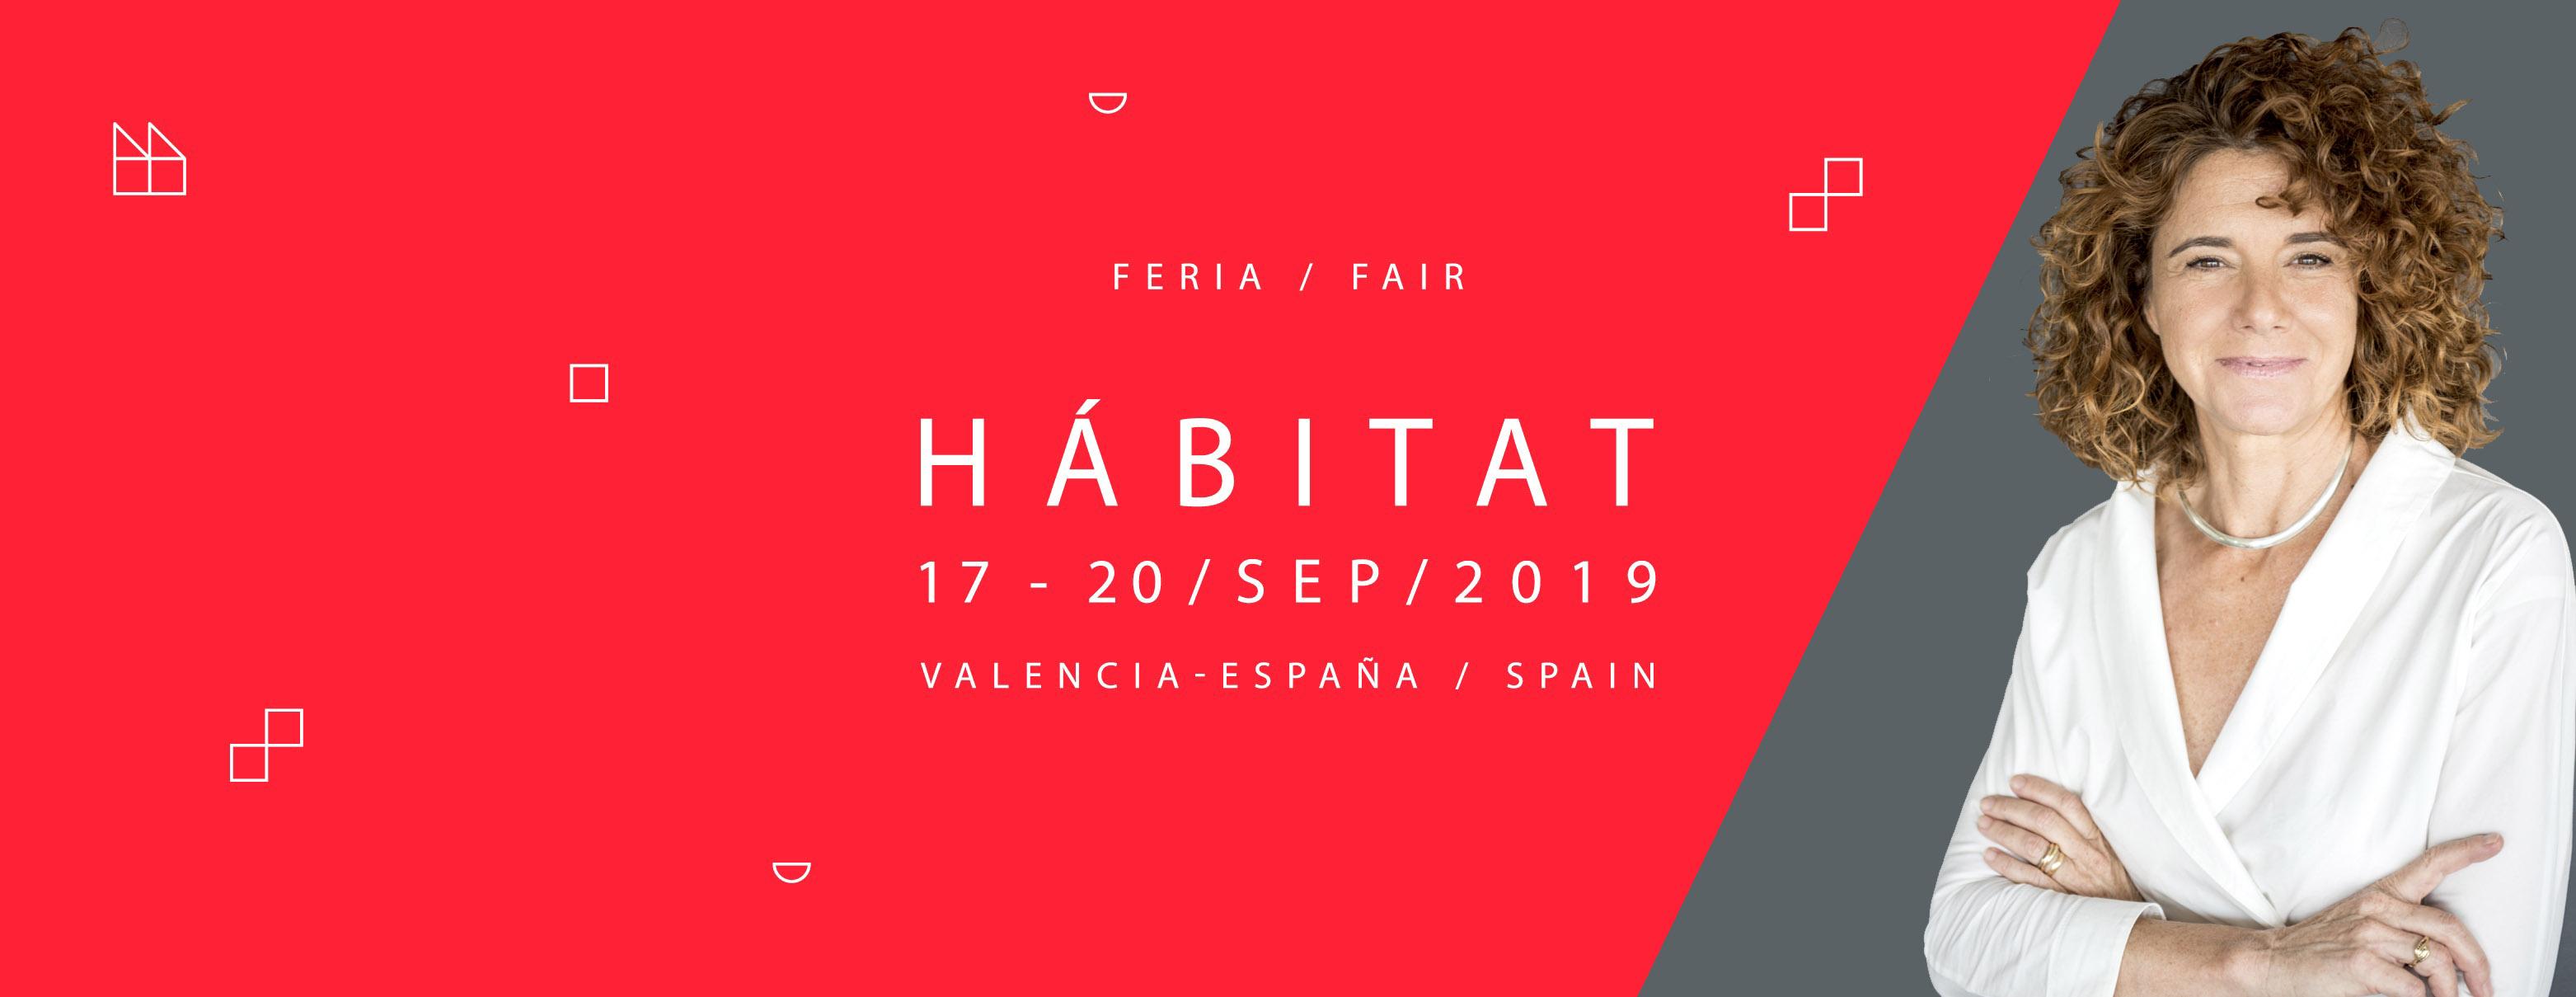 Feria Habitat Valencia - Rosa Colet copy